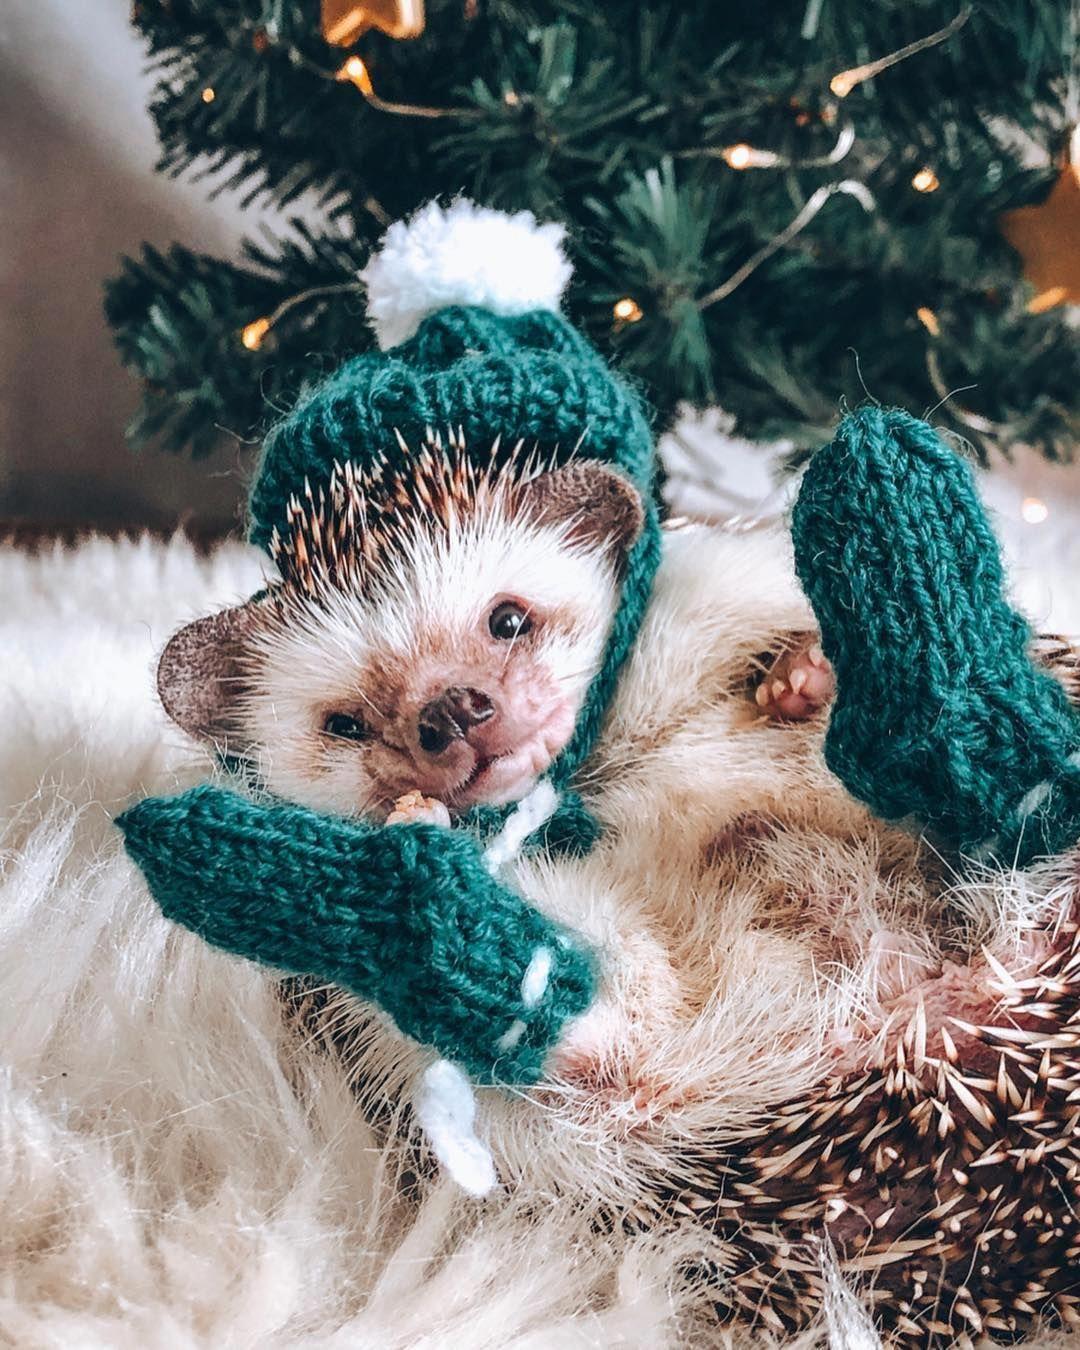 Mrpokee the hedgehog on instagram when your hedgehog is